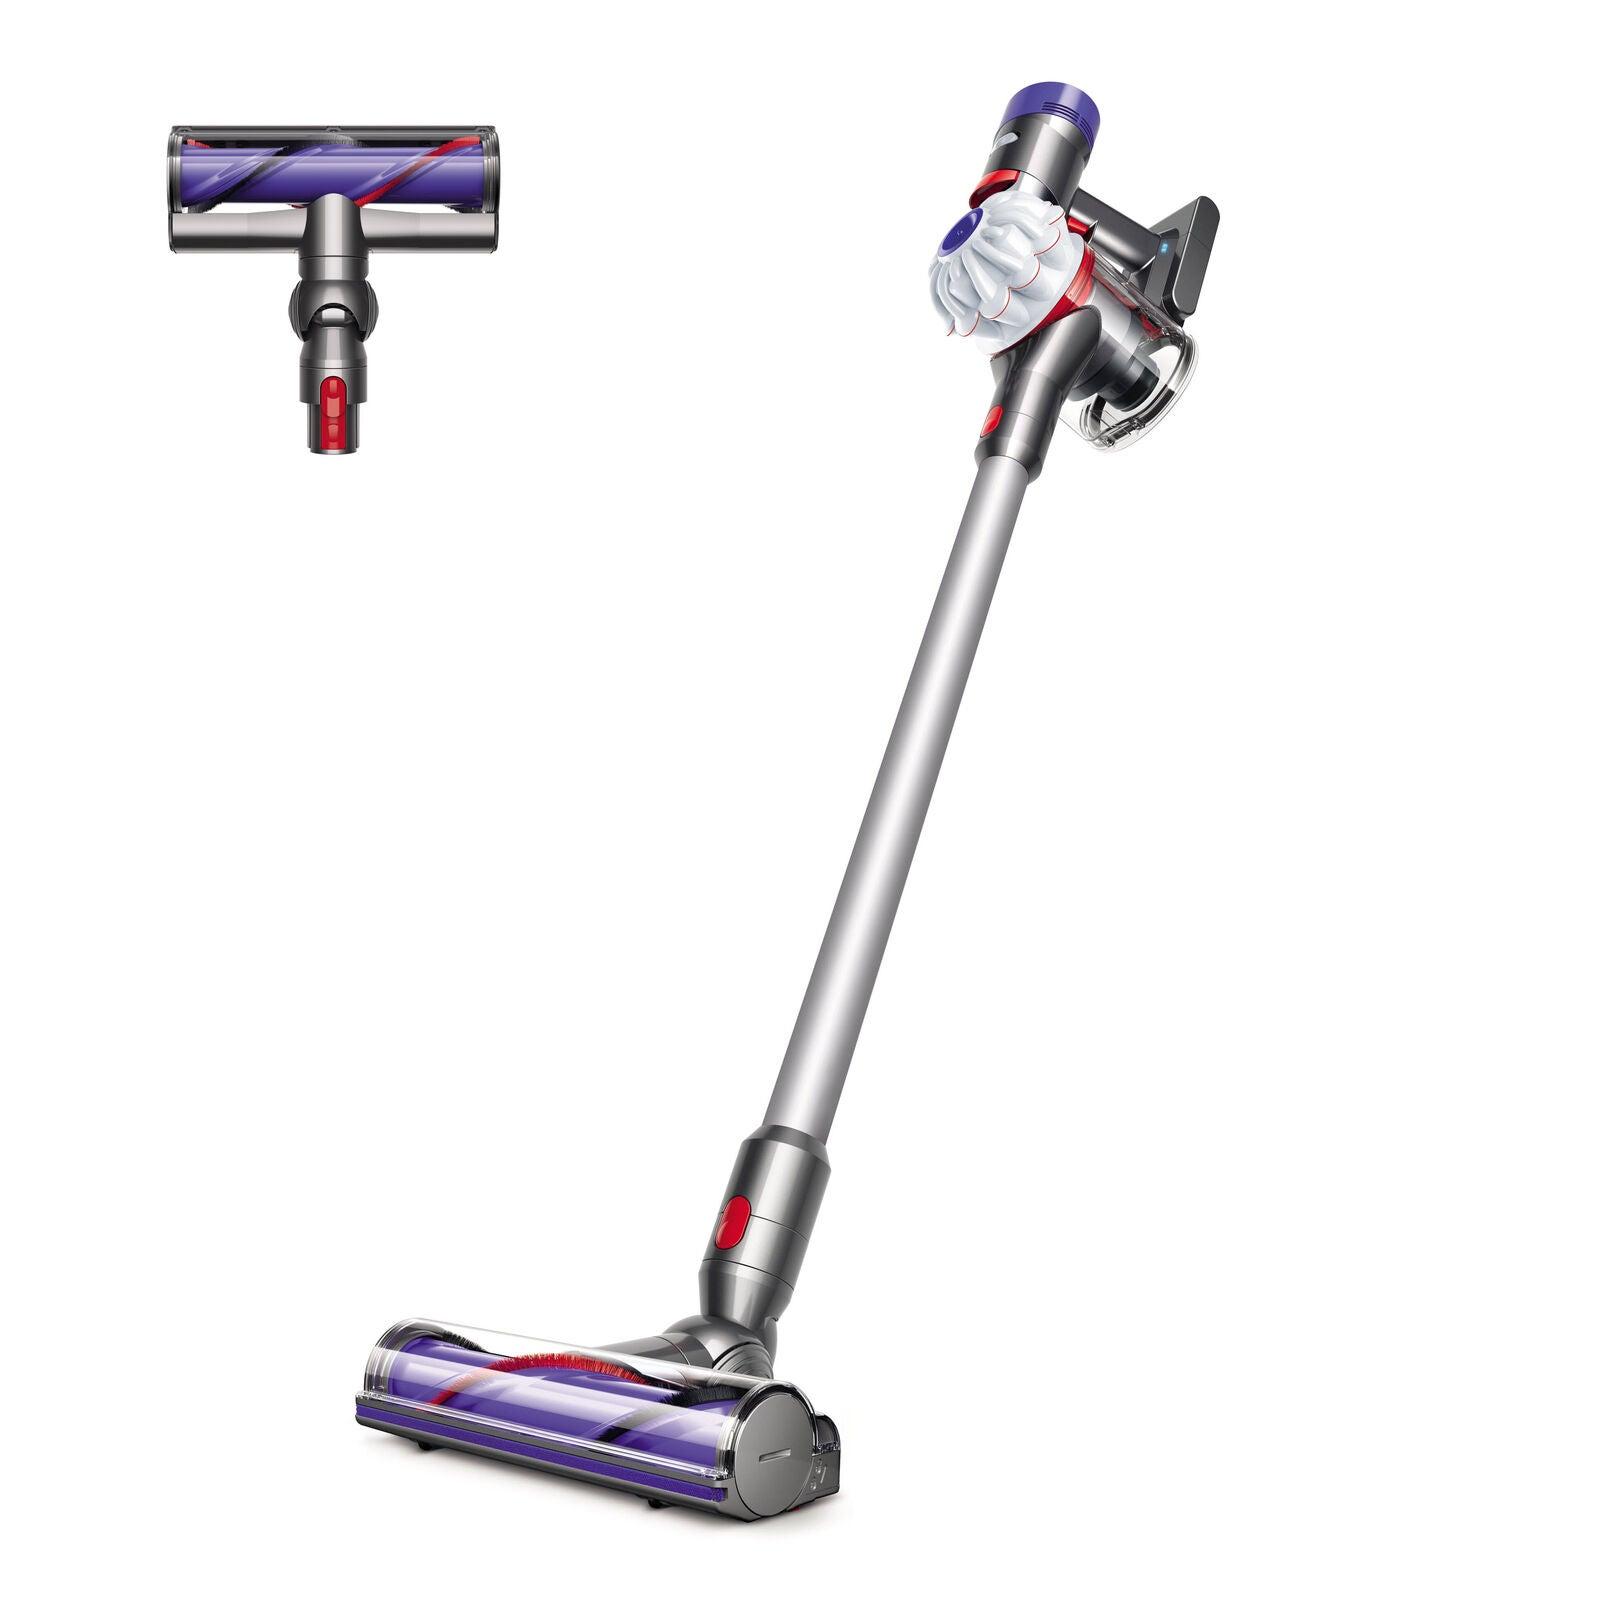 Dyson V7 Allergy Cordless Vacuum